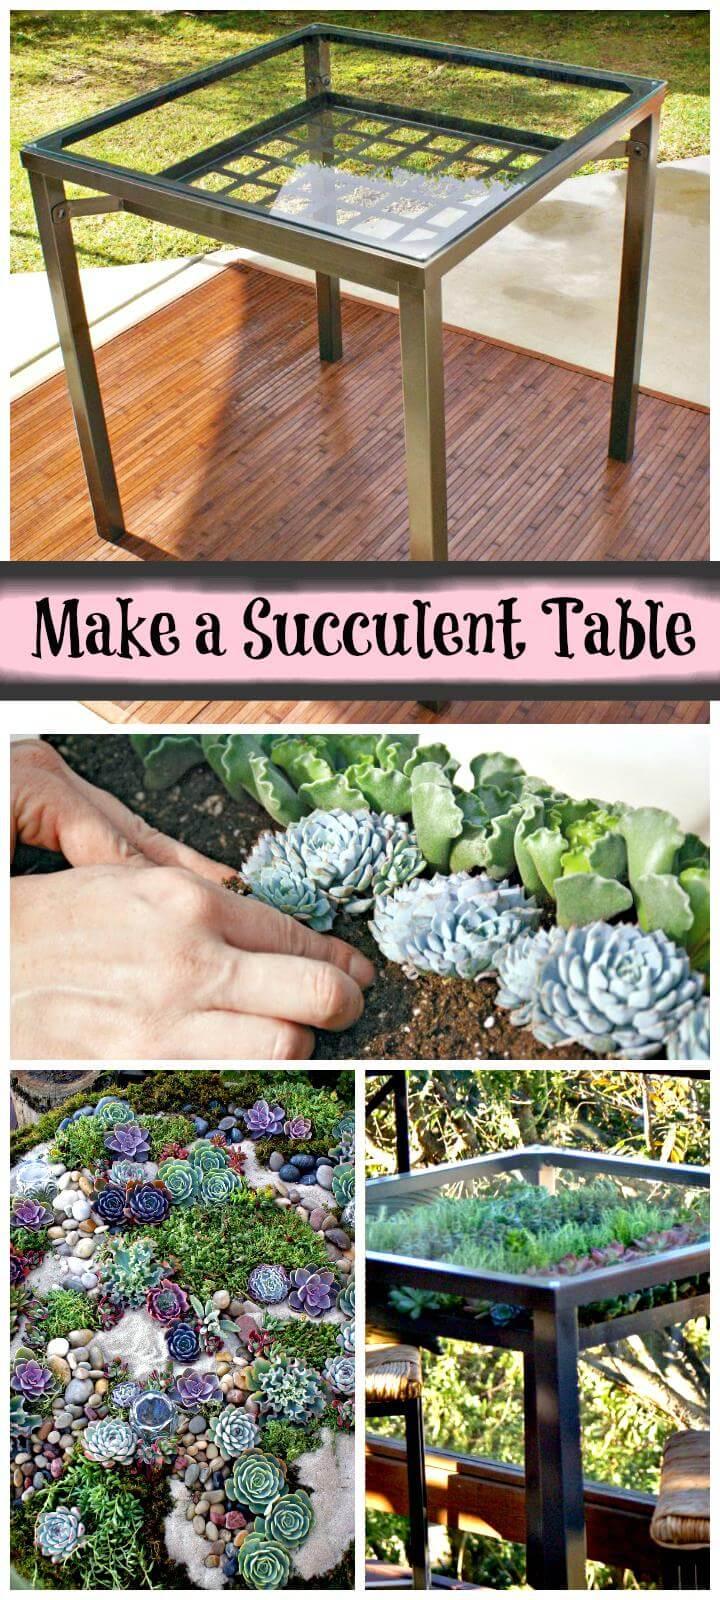 DIY handmade succulent table